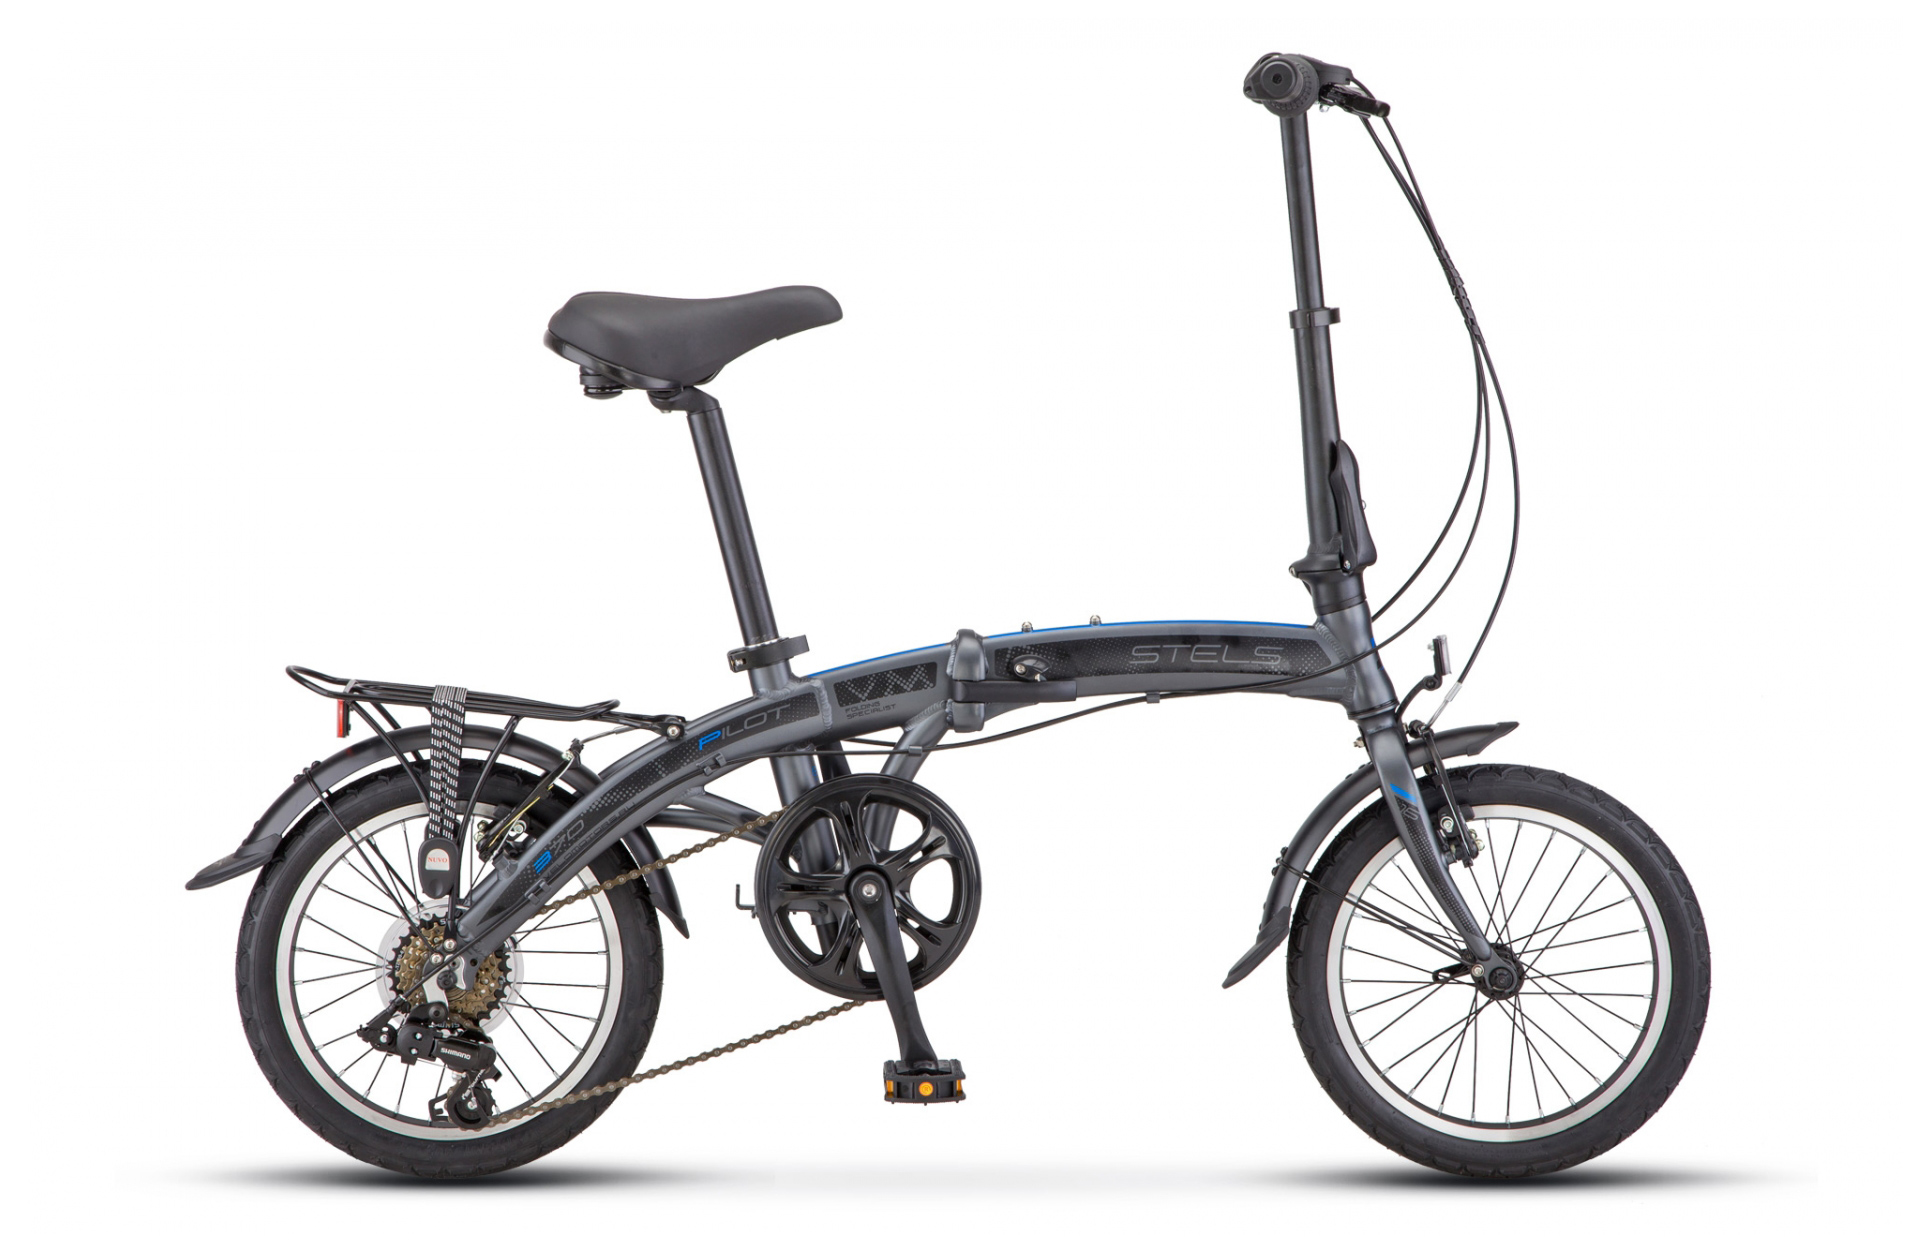 Велосипед Stels Pilot 370 16 (V010) 2019 велосипед stels pilot 170 16 2016